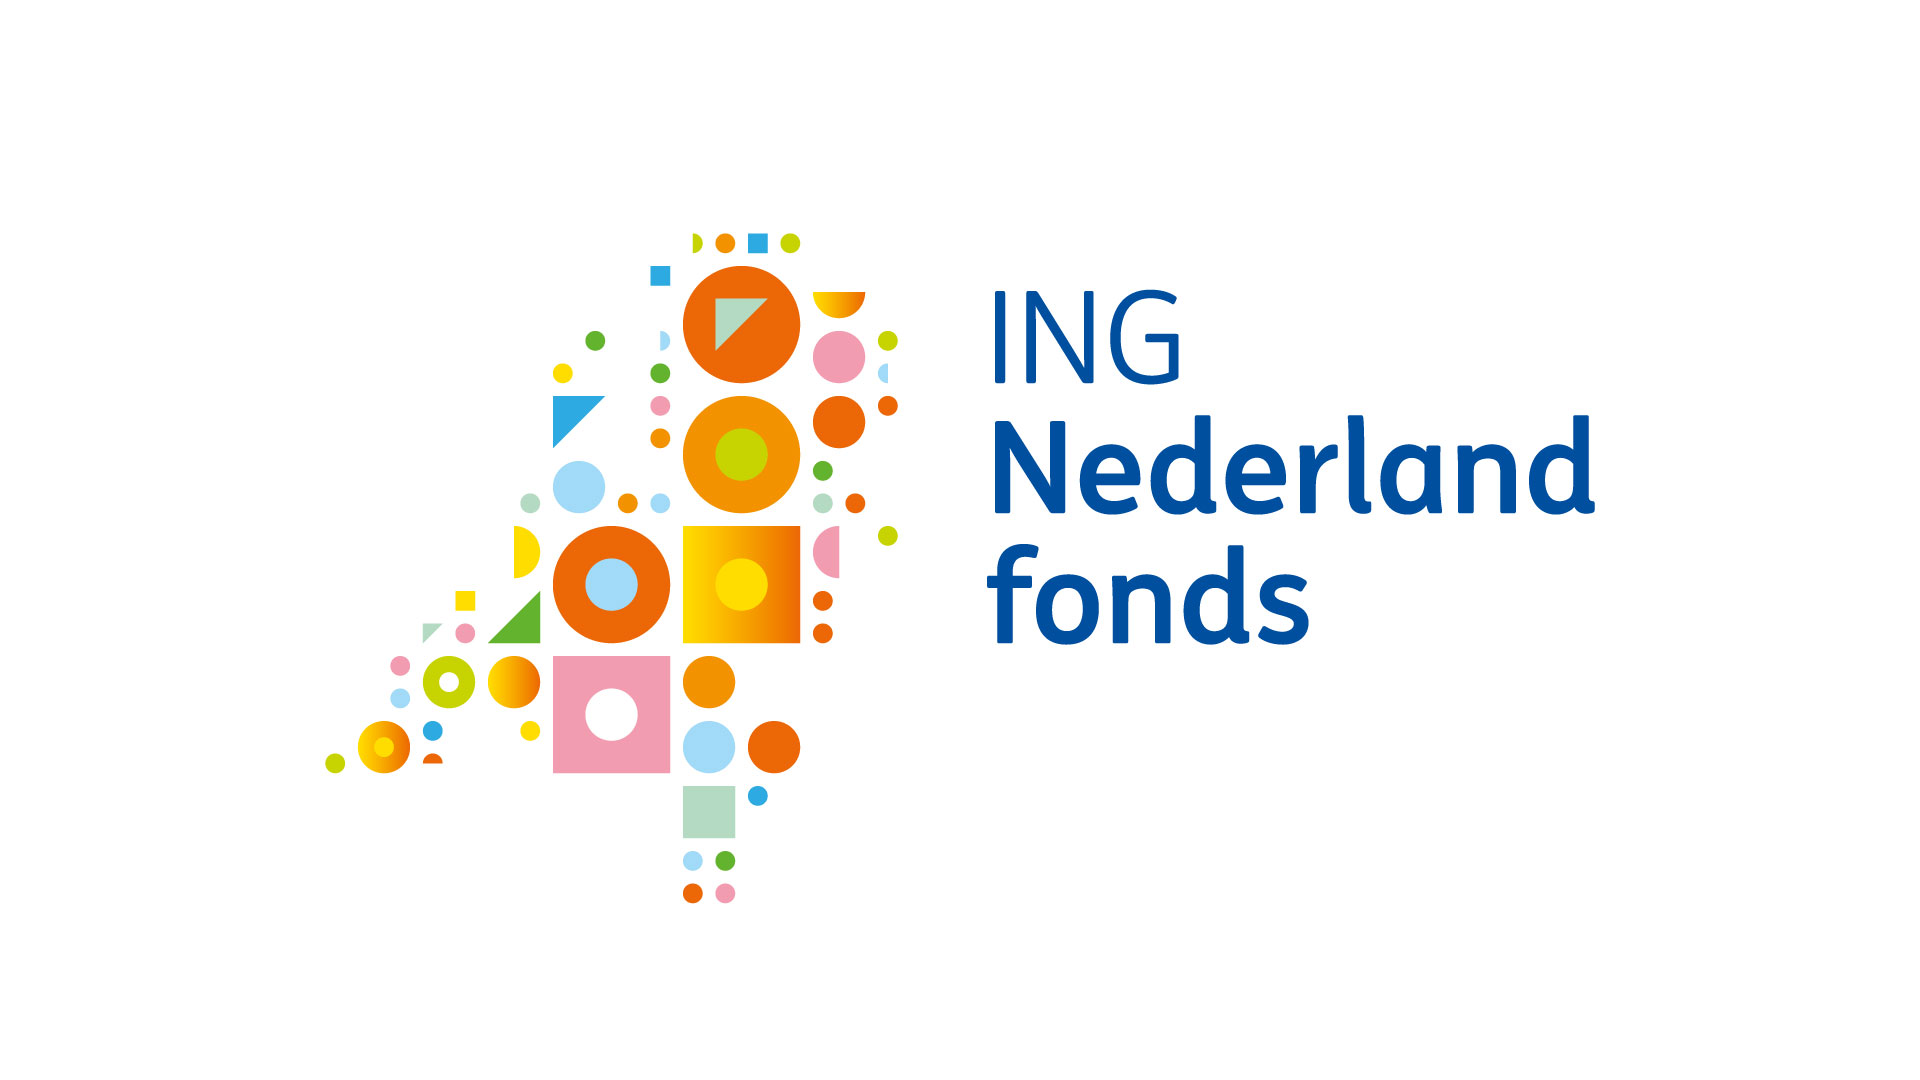 ing nederland fonds